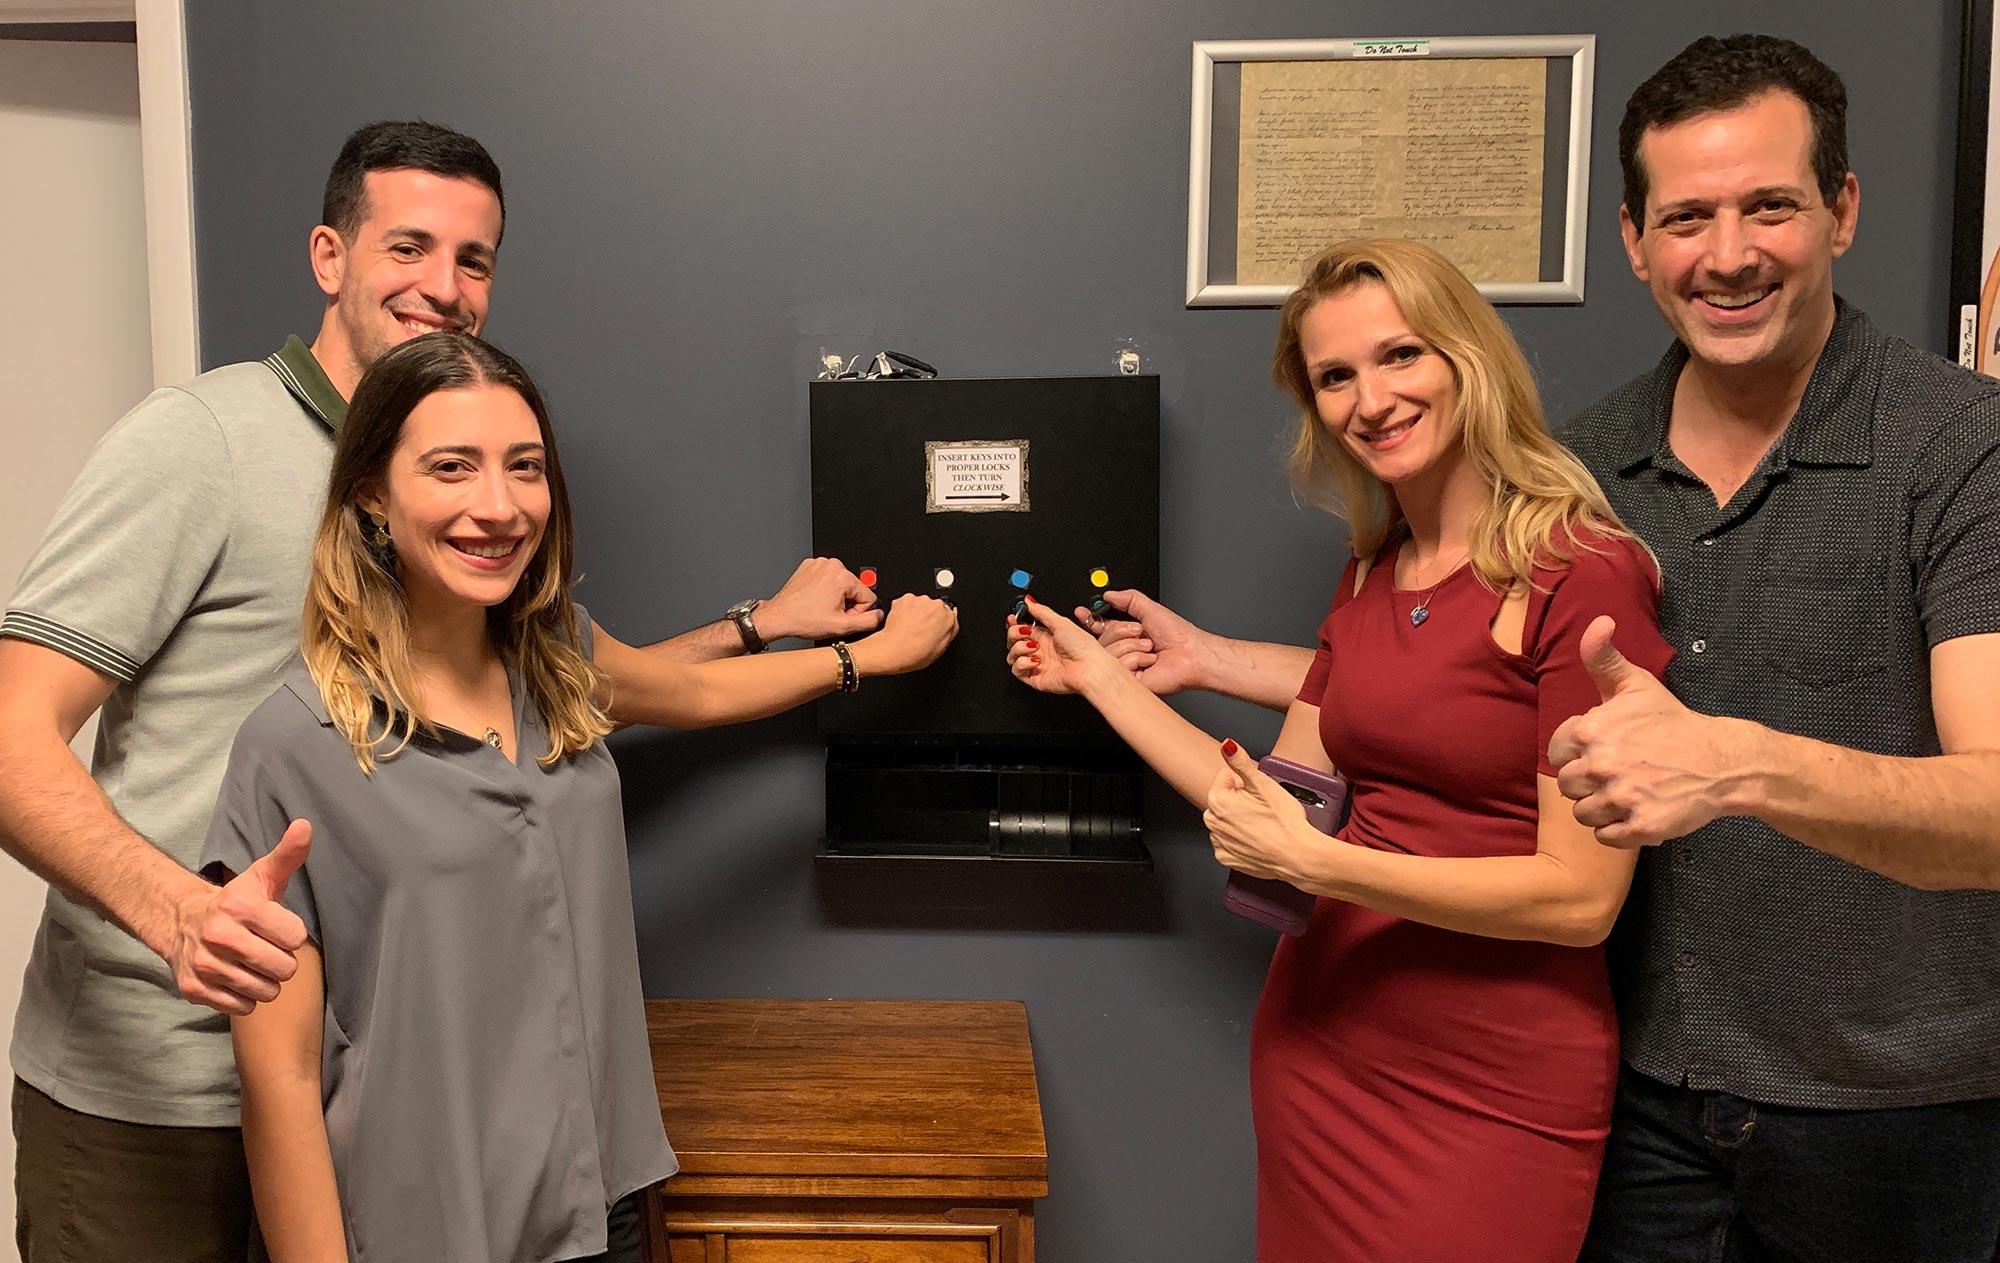 David Demarchena, Nicole Rosa, Ekaterina Khayrulina and Hal Feldman turn keys simultaneously to unlock a new secret at  The Great Escape Room